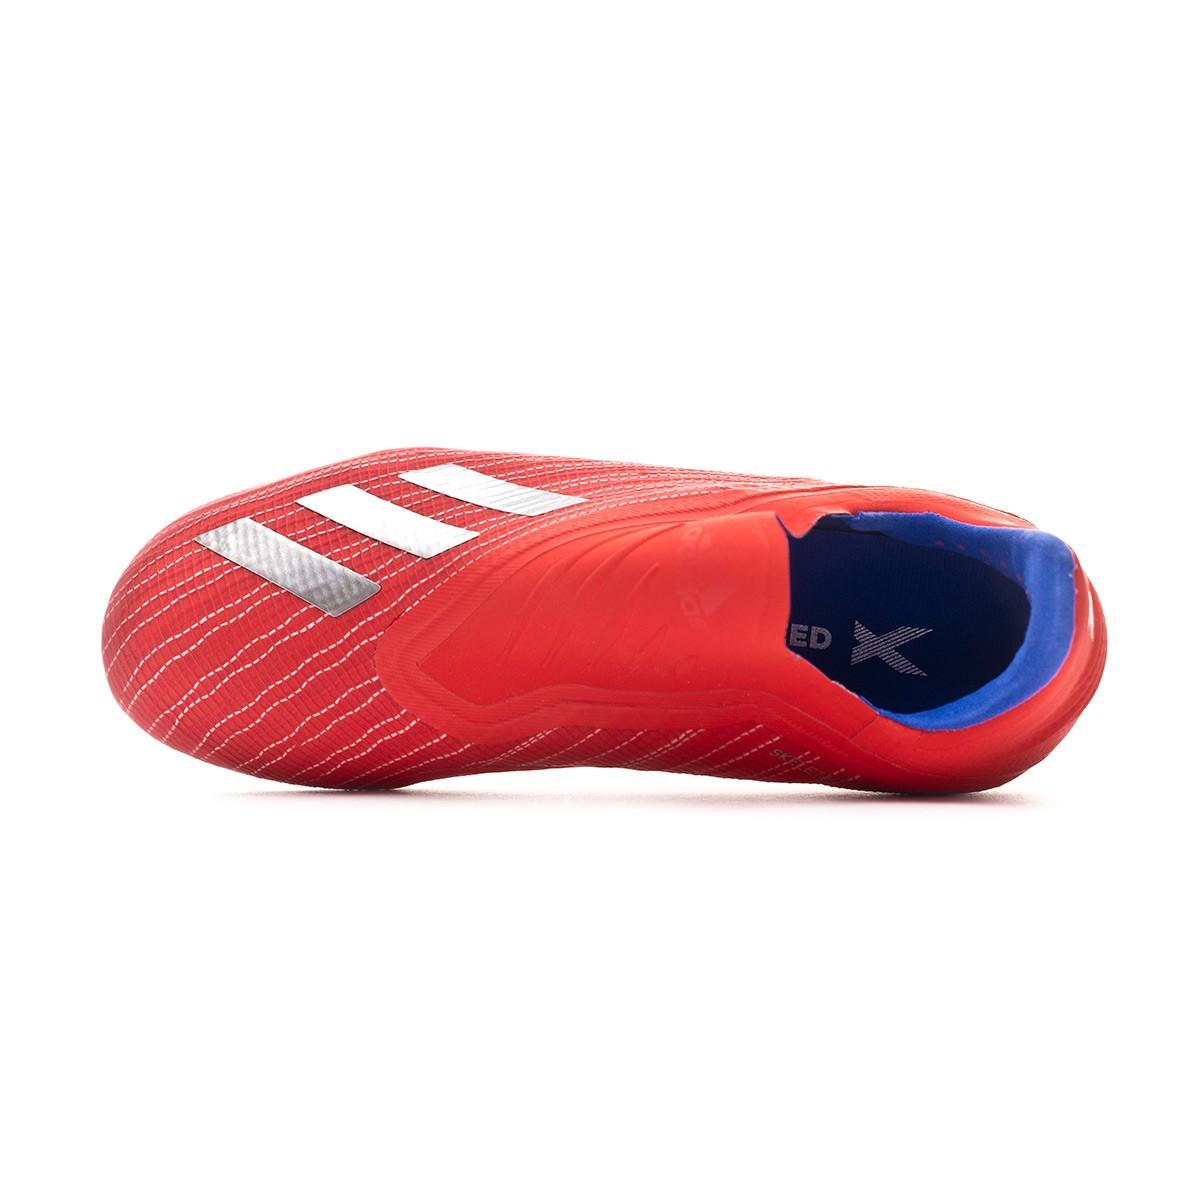 Scarpe adidas X 18+ FG Junior Active red-Silver metallic-Bold blue -  Negozio di calcio Fútbol Emotion c033c95666c